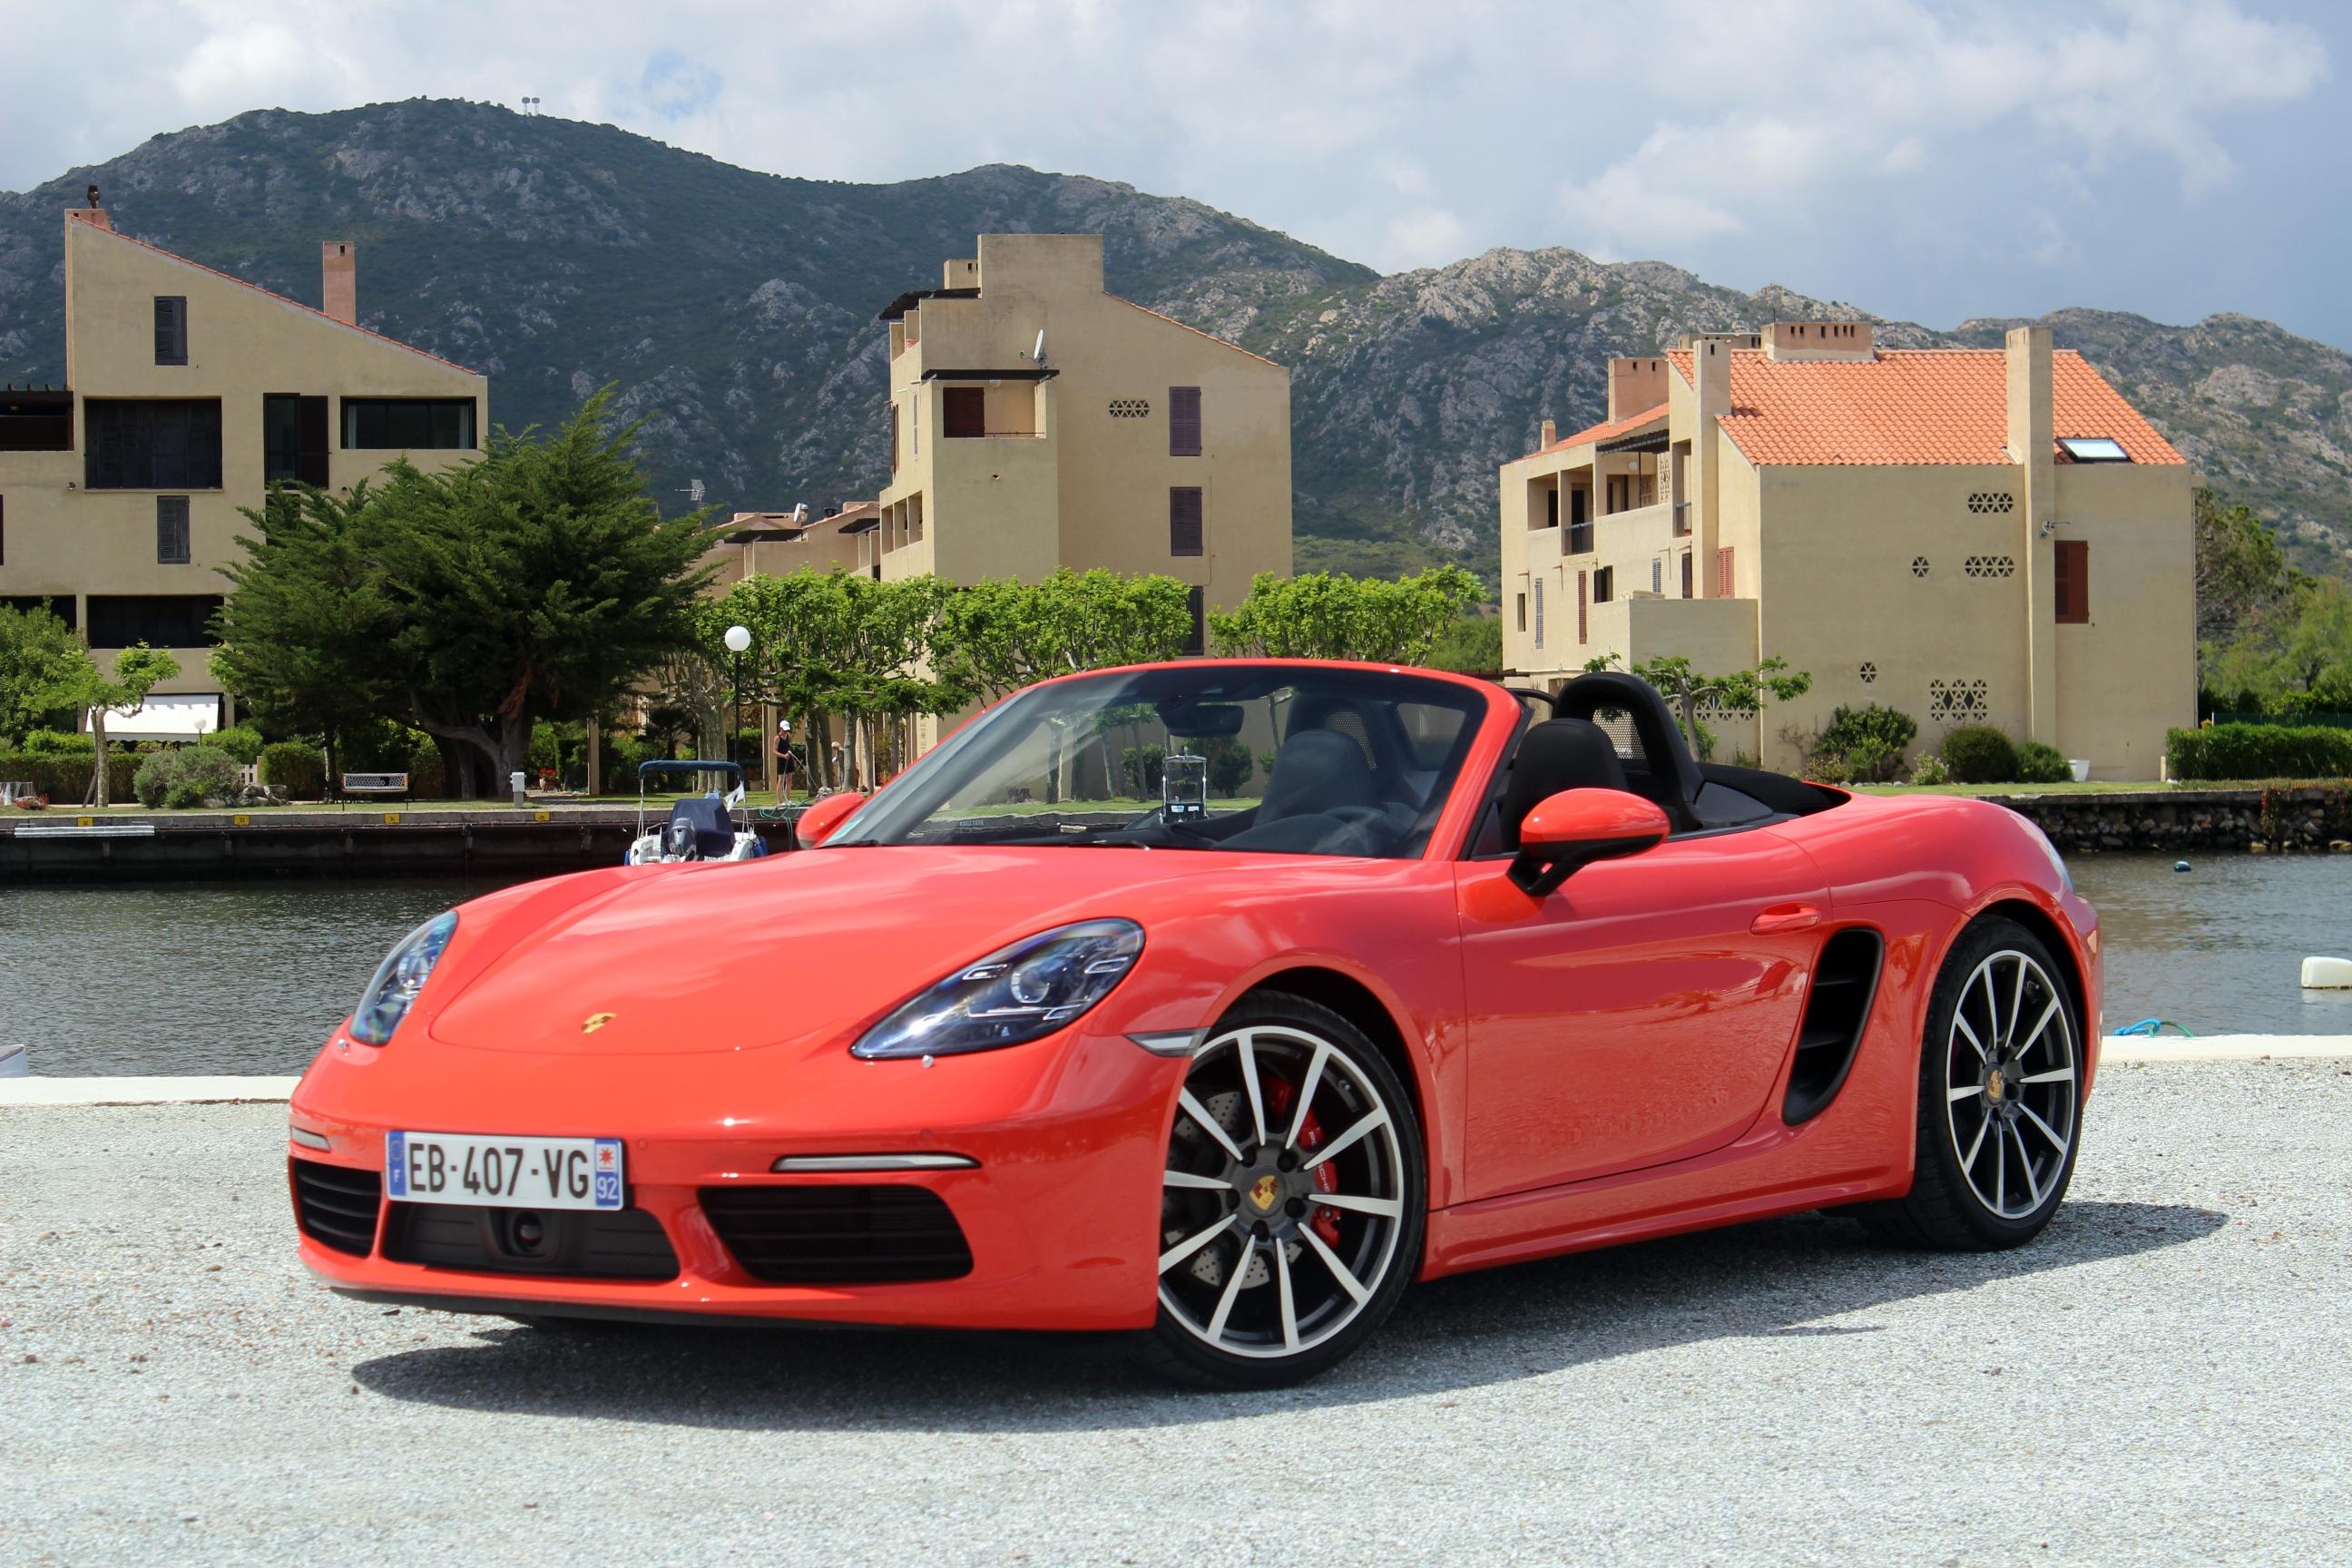 Essai Vid 233 O Porsche Boxster 718 Se Mettre En 4